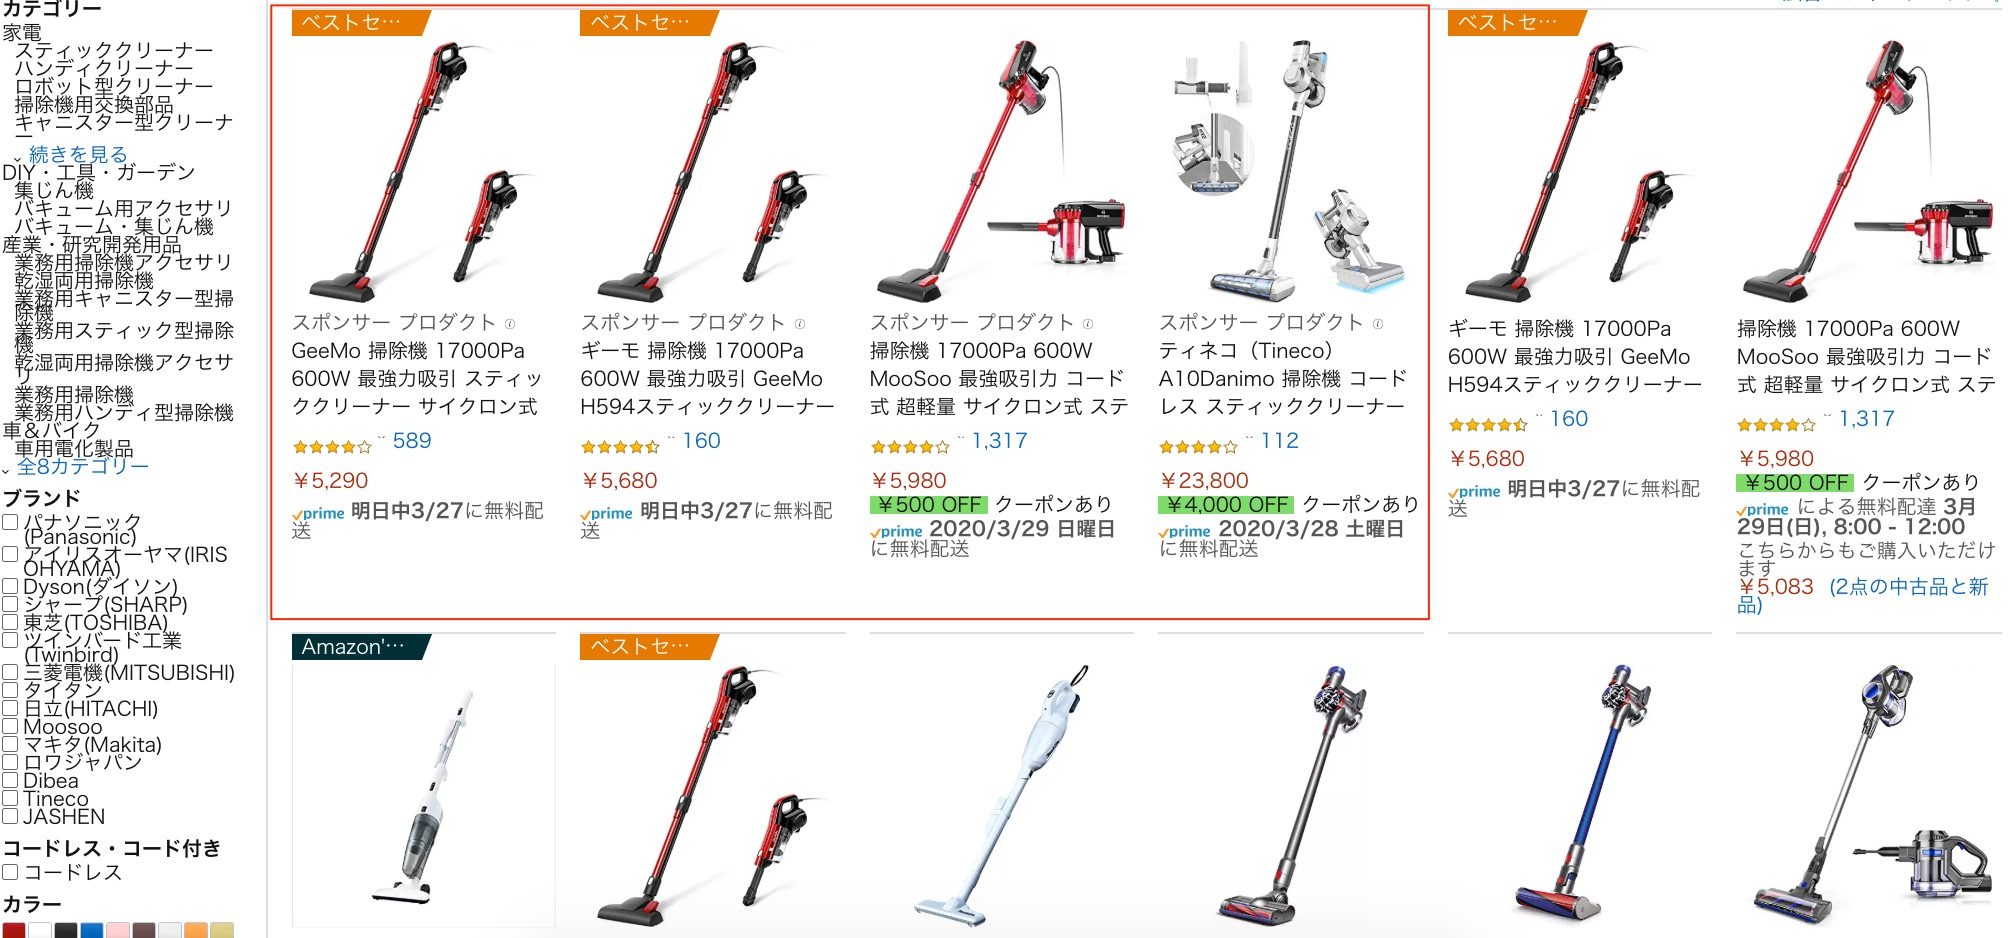 Amazonスポンサープロダクト事例